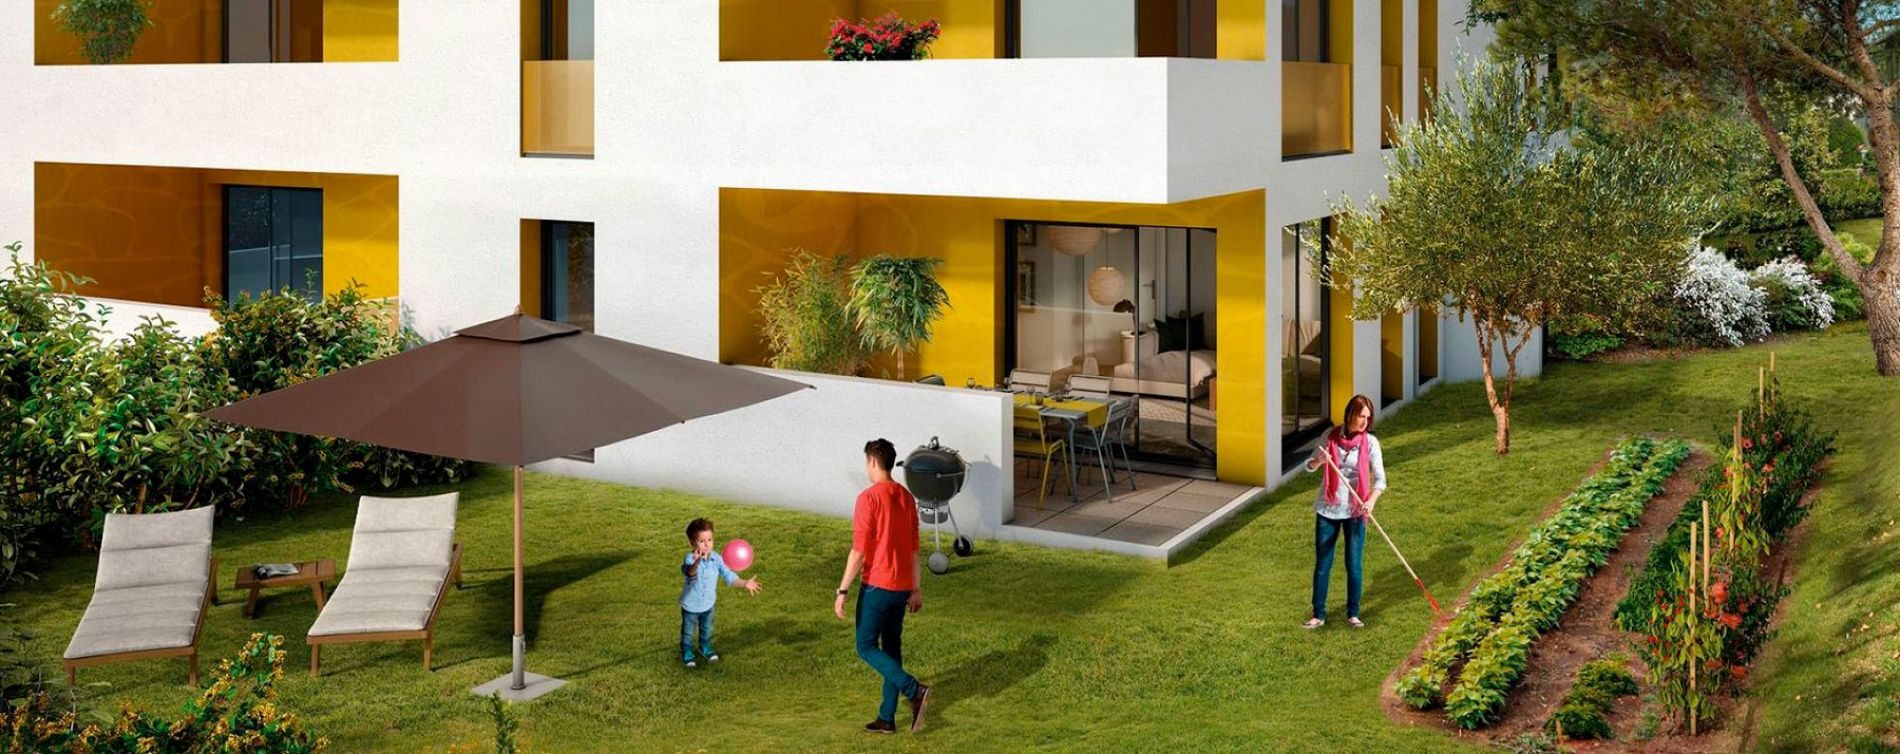 Montpellier : programme immobilier neuve « Programme immobilier n°215994 » (2)